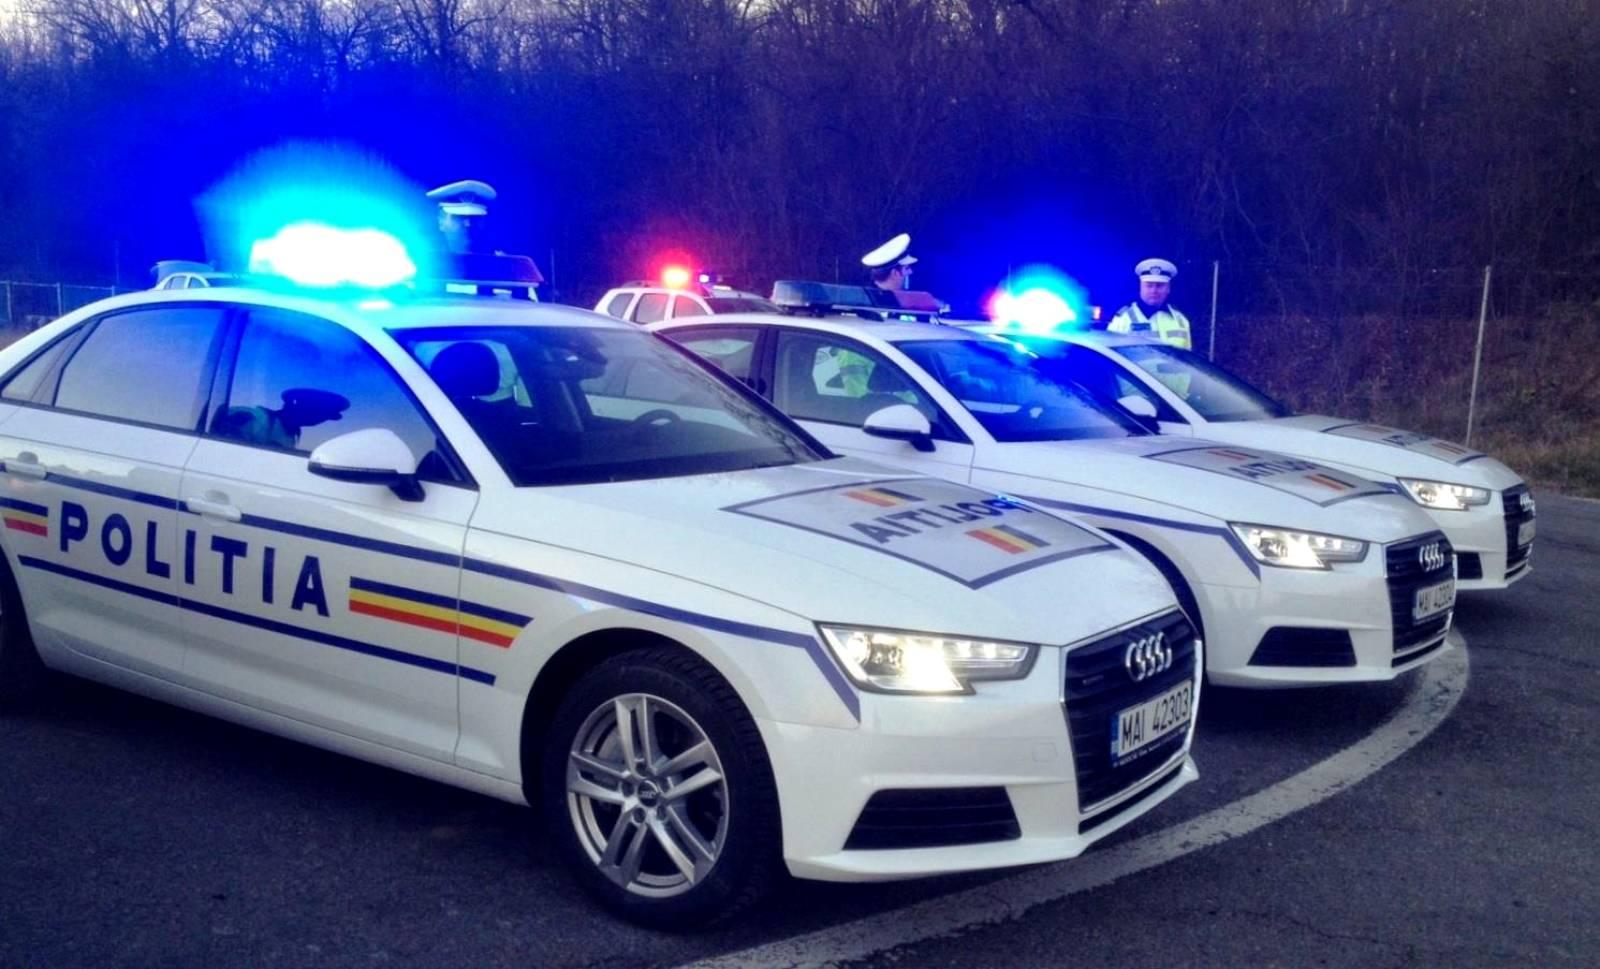 Politia Romana video urmarire